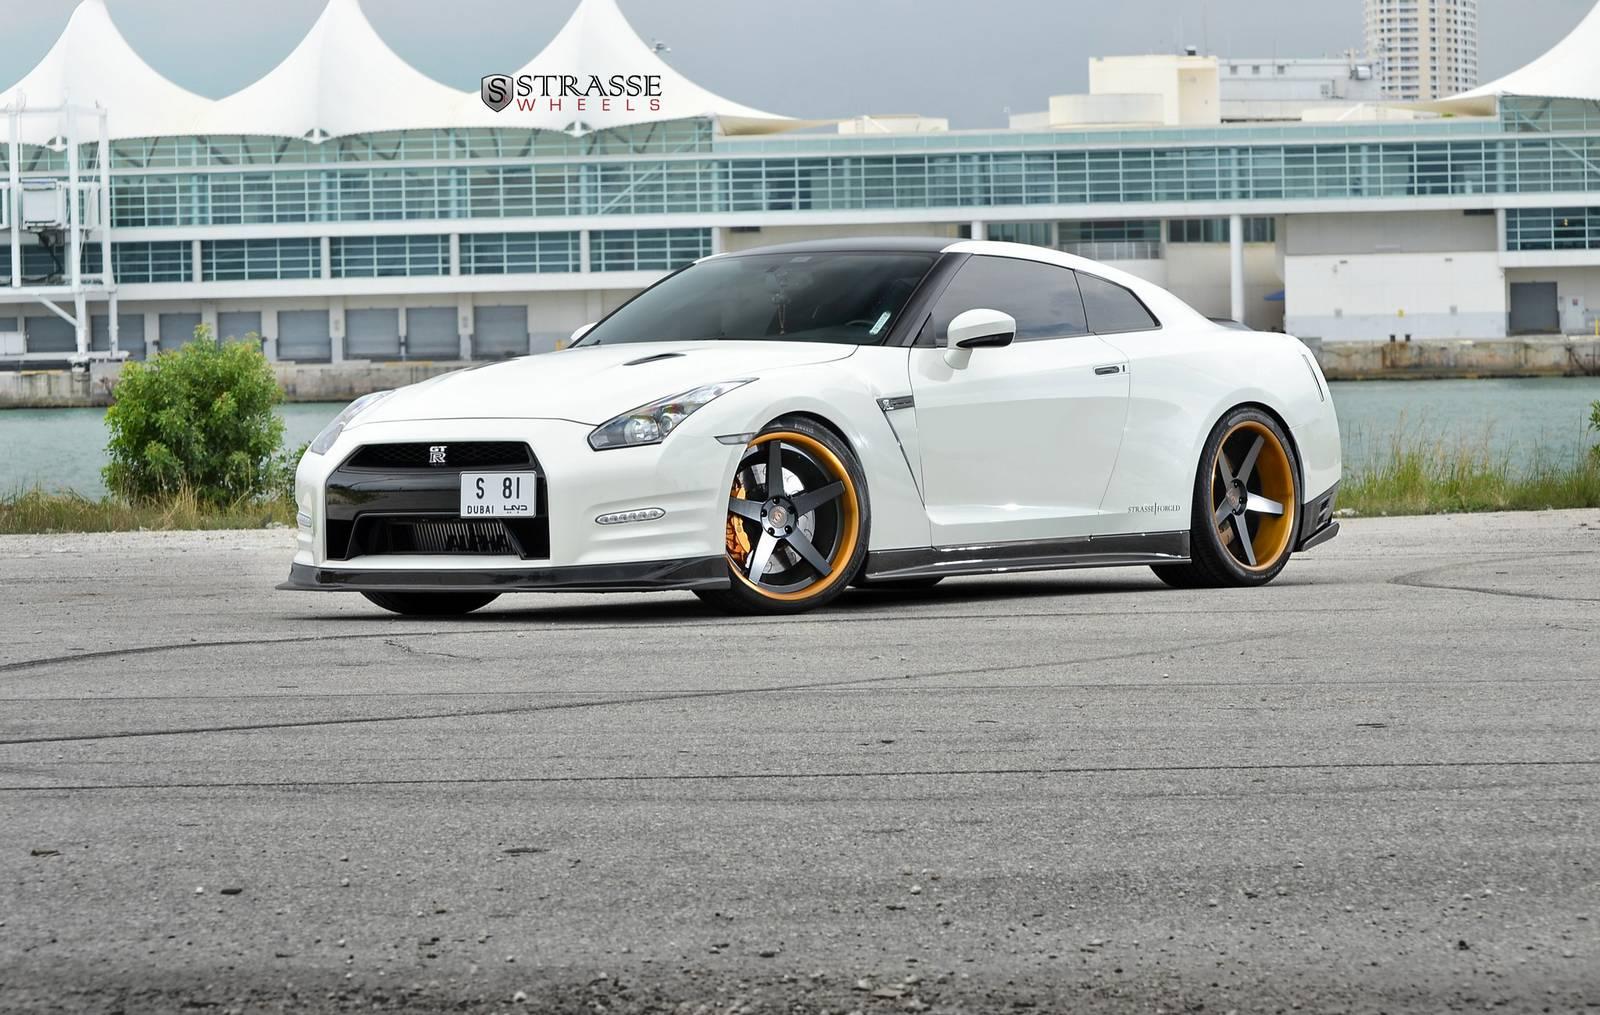 Ams Alpha 9 Nissan Gt R With Deep Concave Strasse Wheels Gtspirit Rims